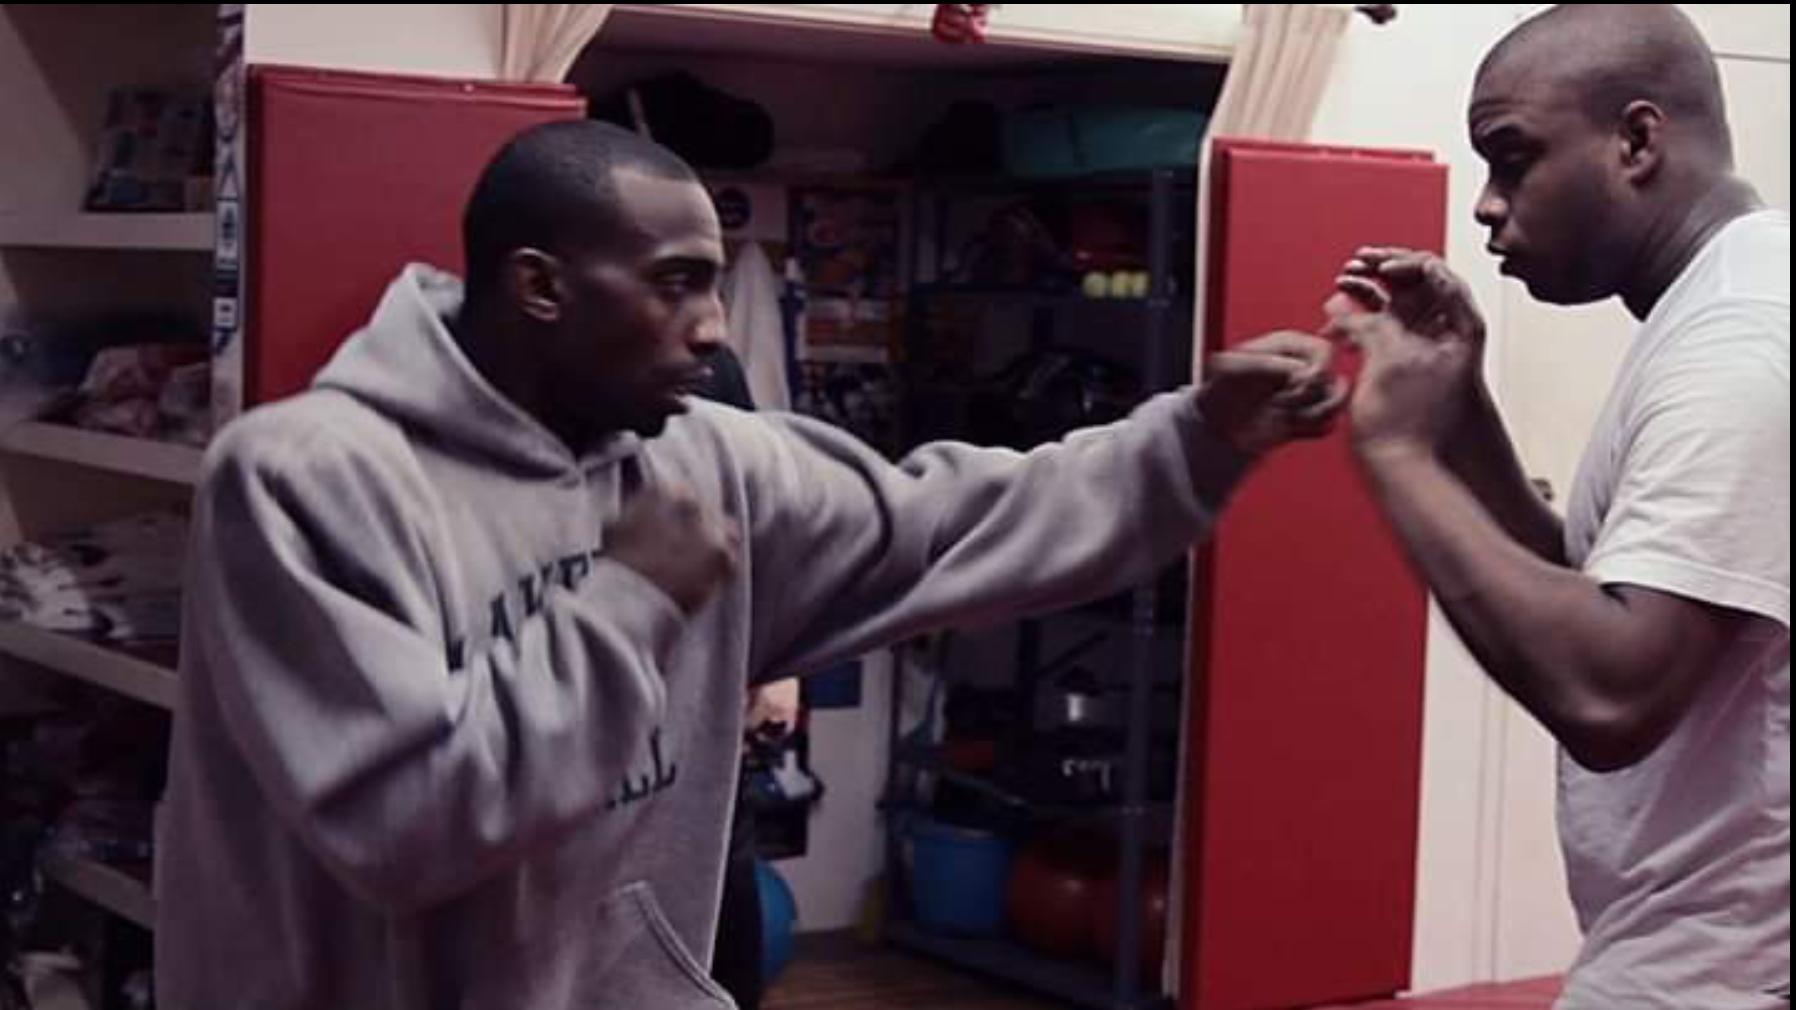 Bradley Desir in New York Mixed Martial Arts (2011)